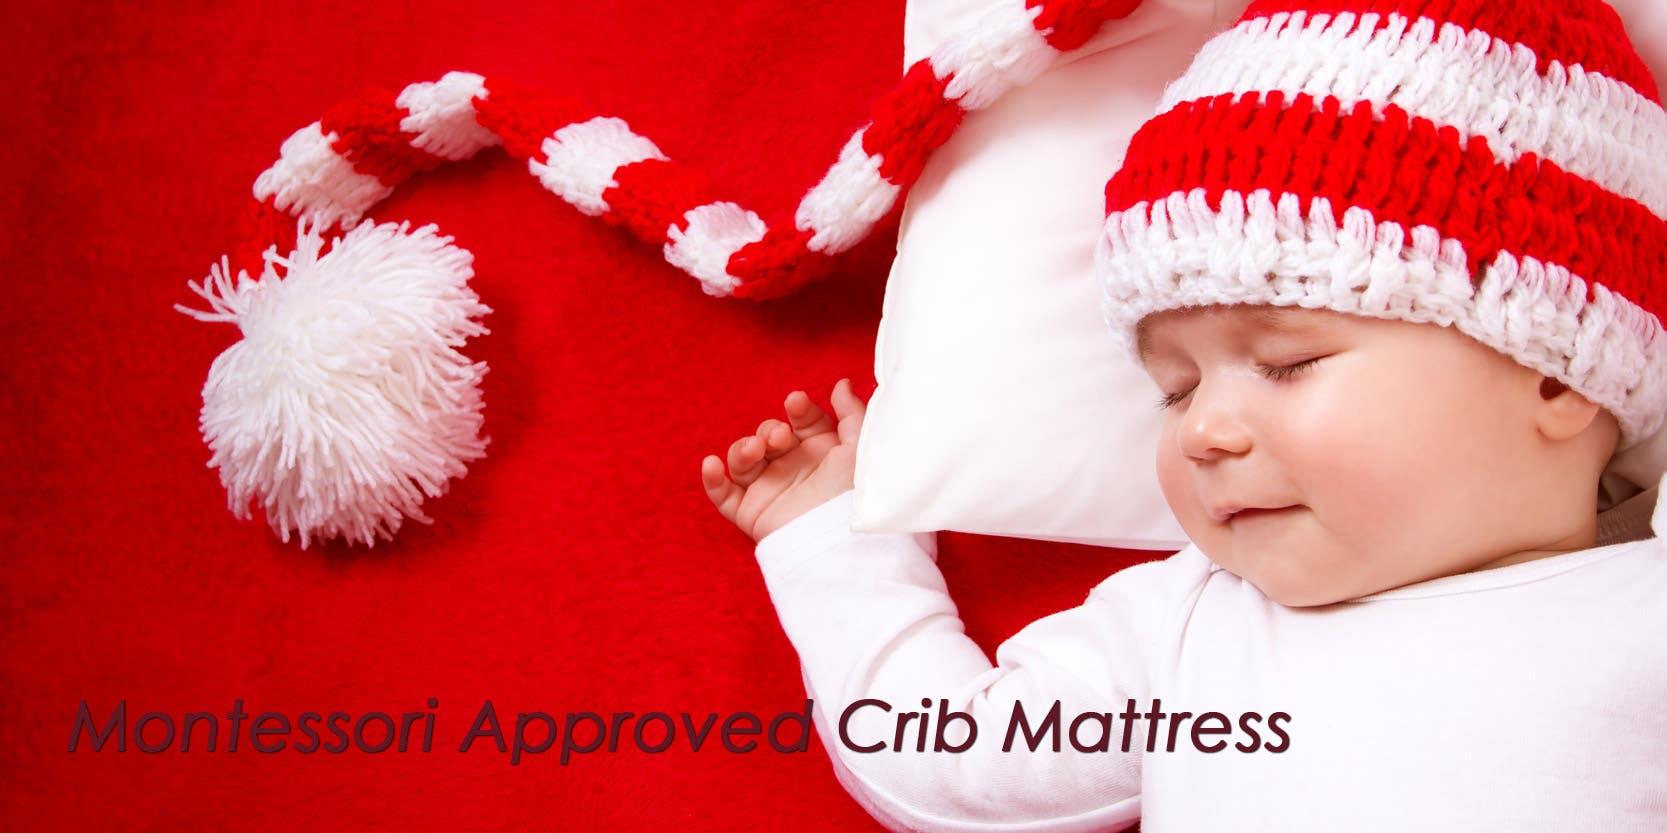 Safe Crib Mattress